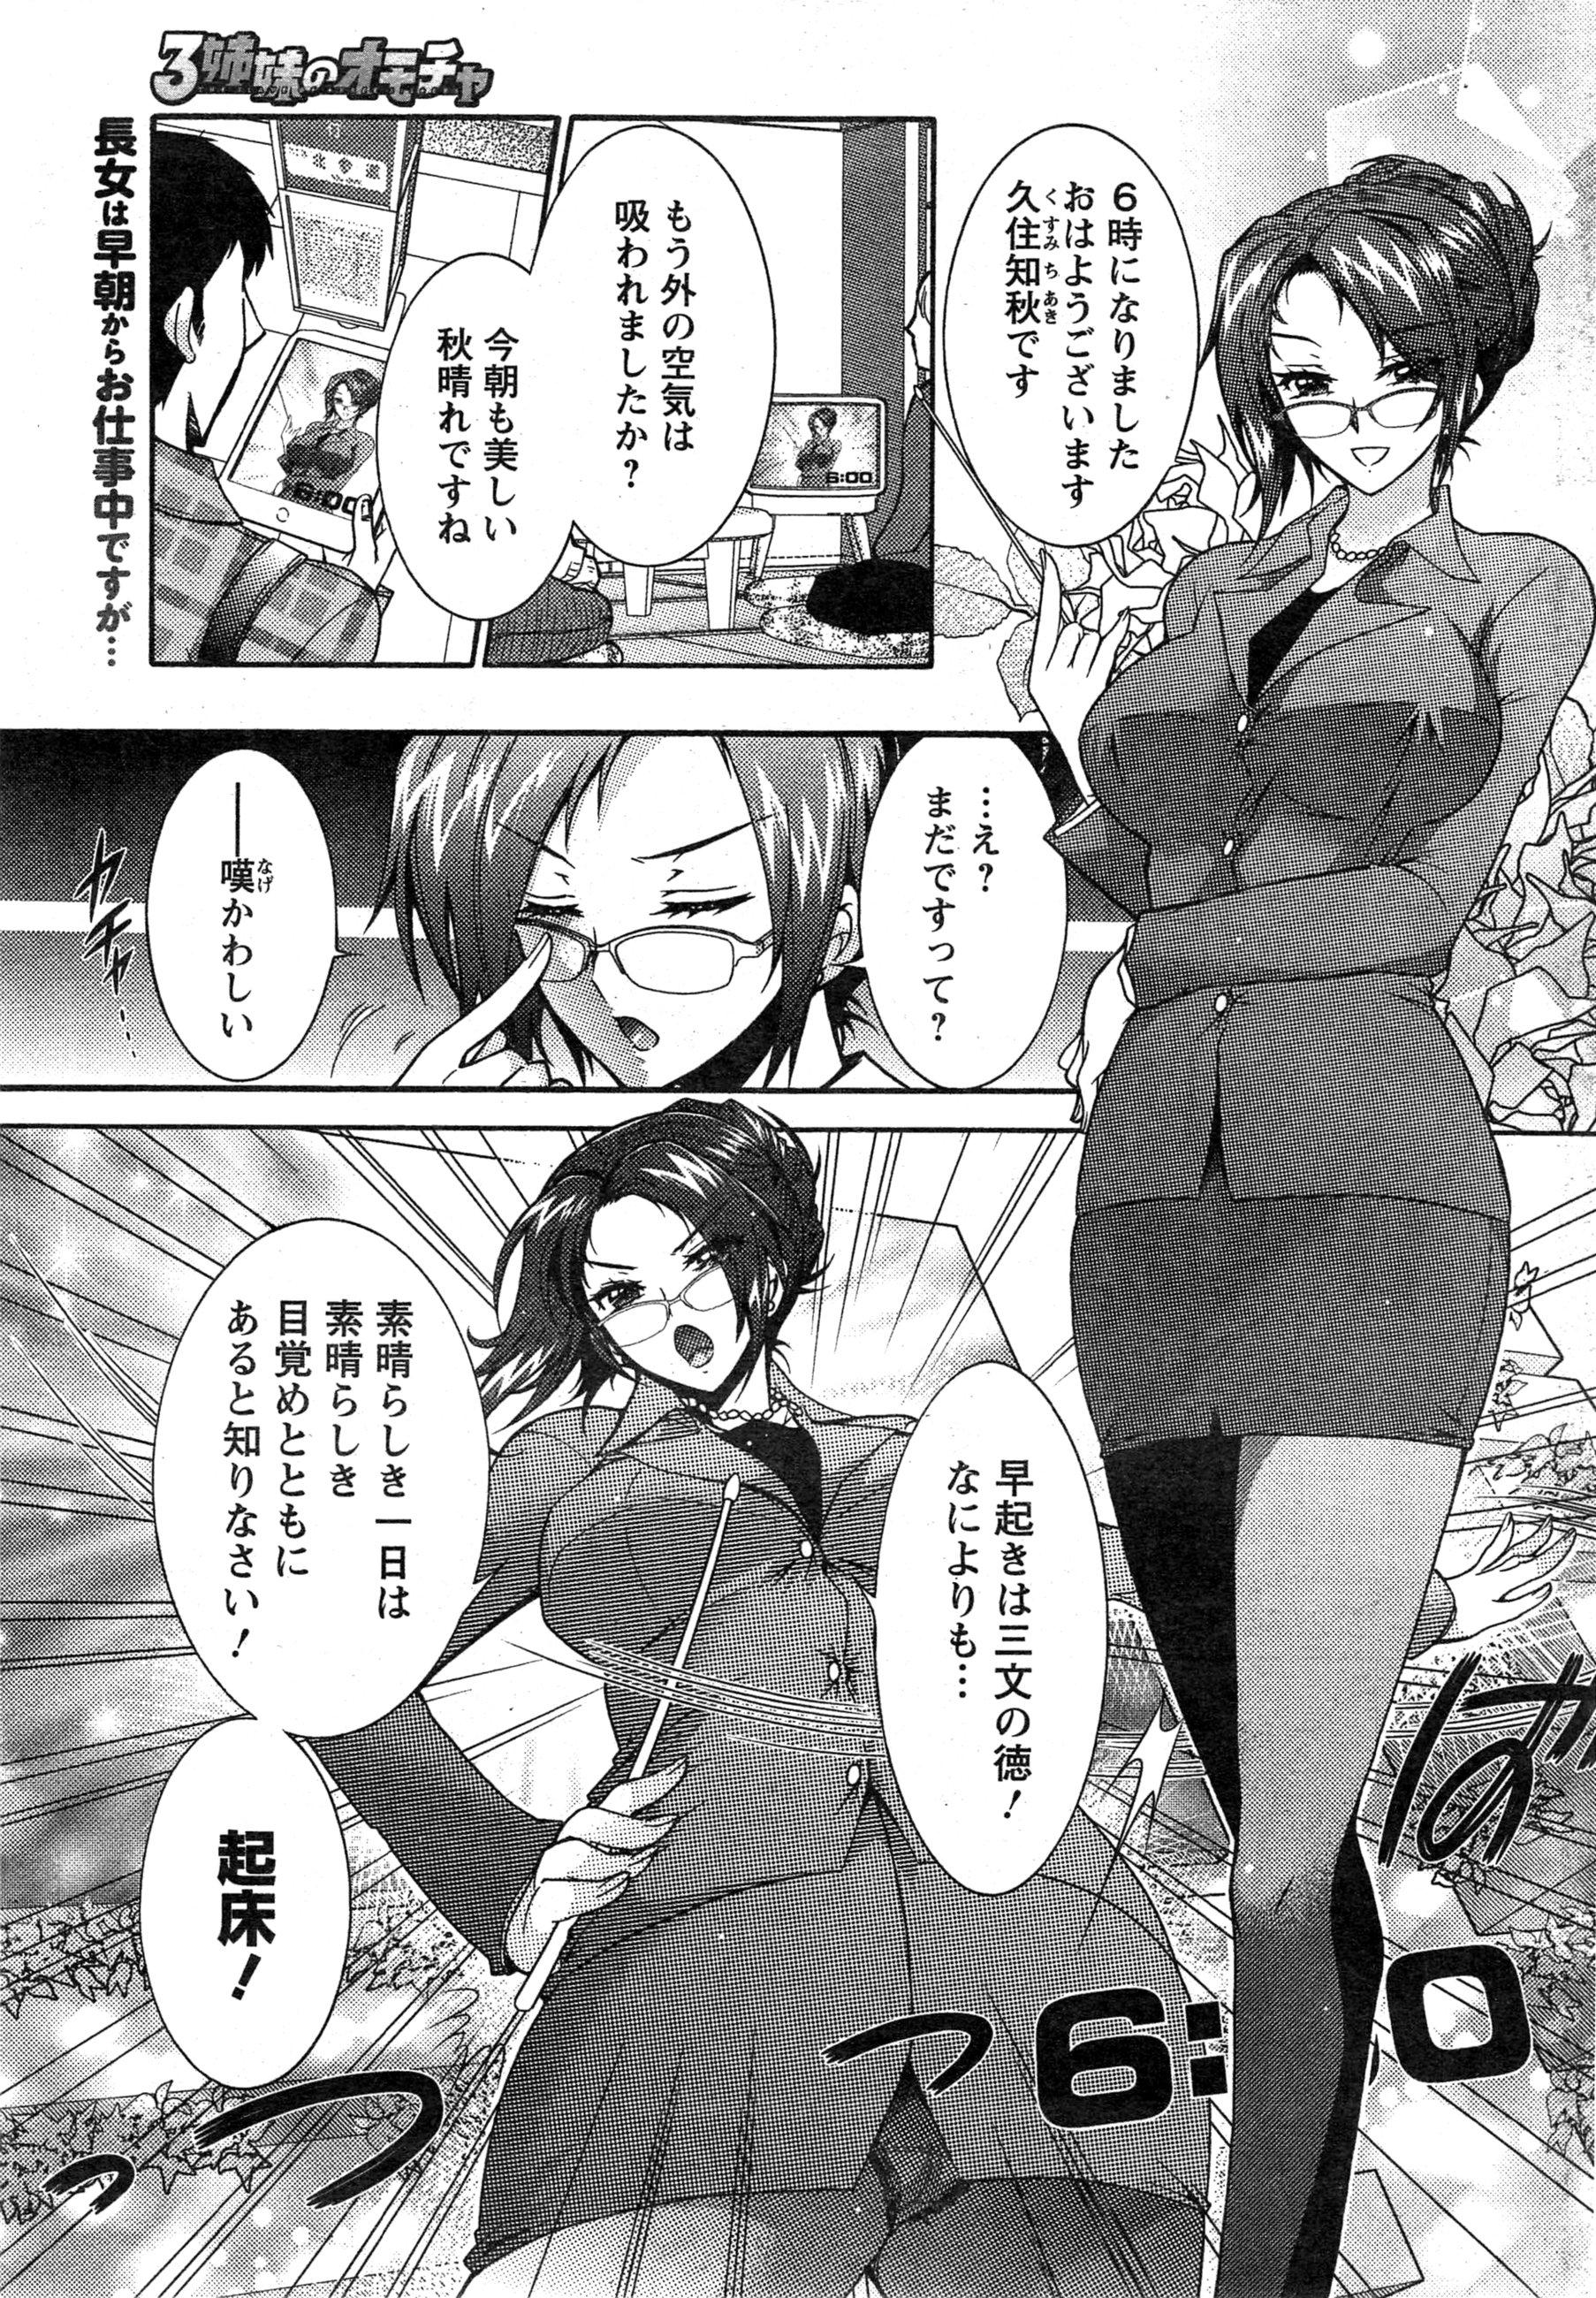 [Honda Arima] Sanshimai no Omocha - The Slave of Three Sisters Ch. 1-6 21